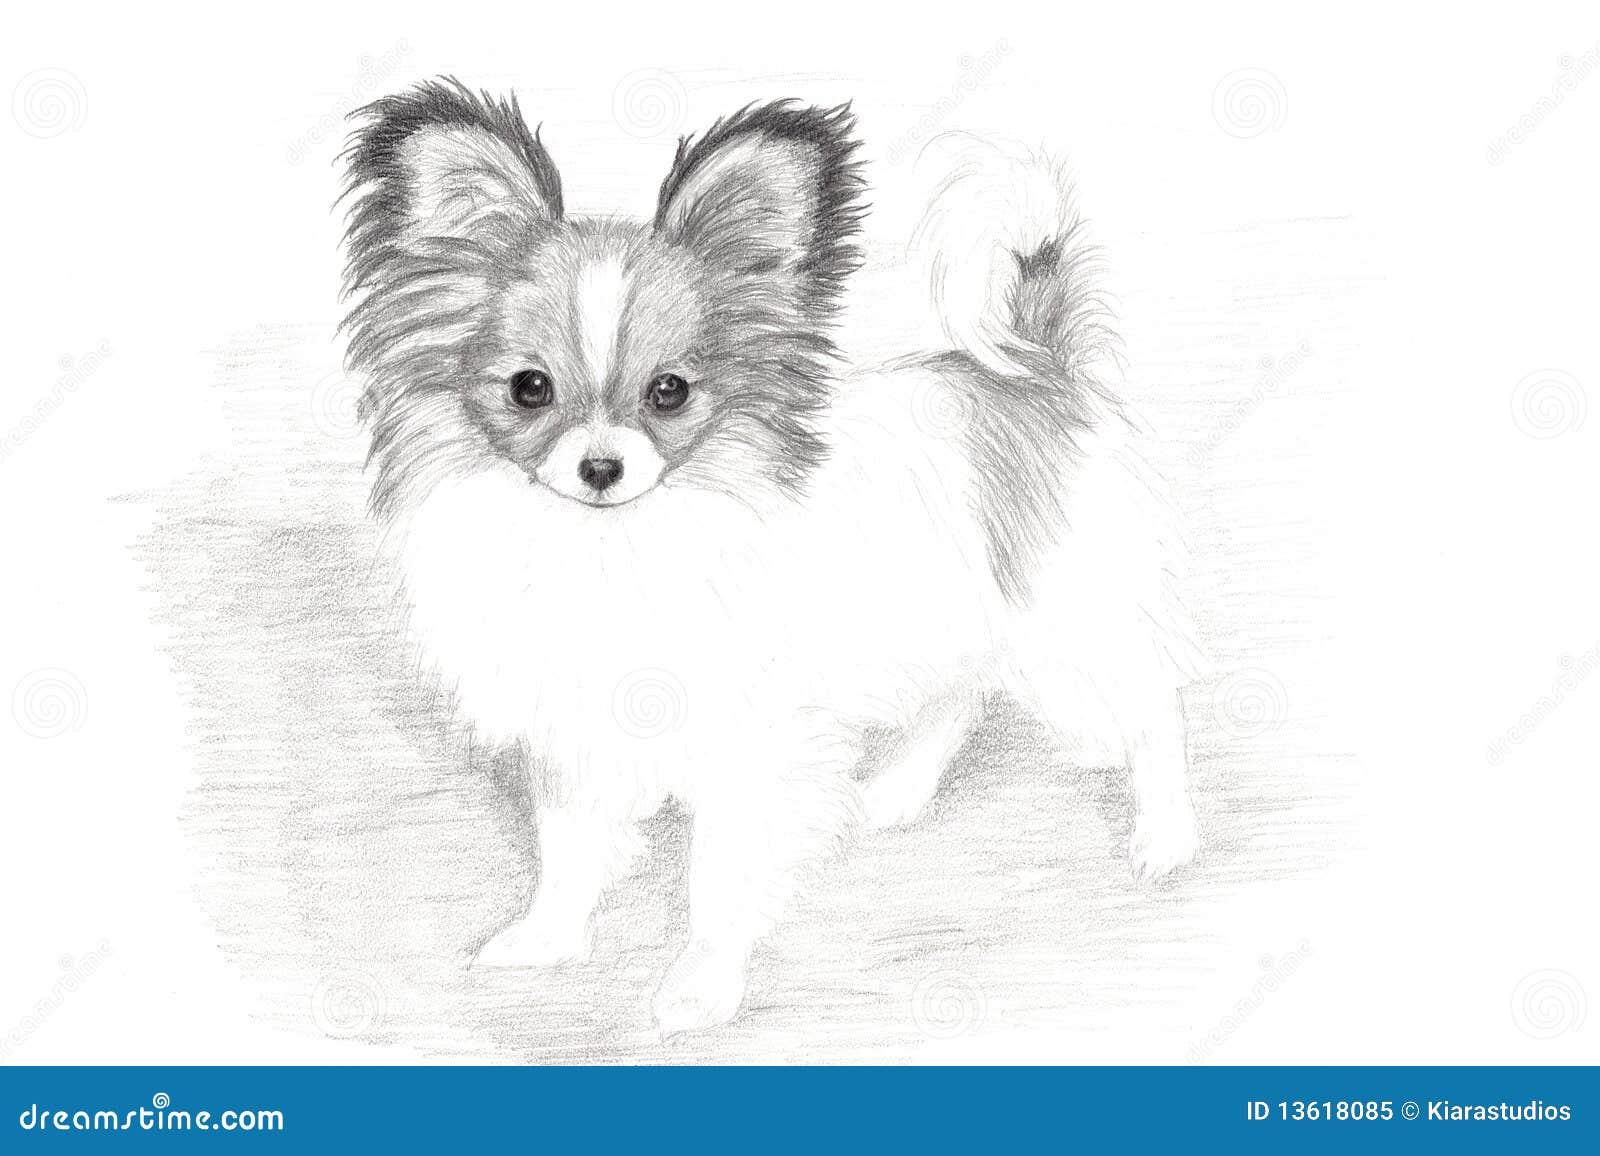 Adorable Papillon Puppy Hand Drawn Art Royalty Free Stock